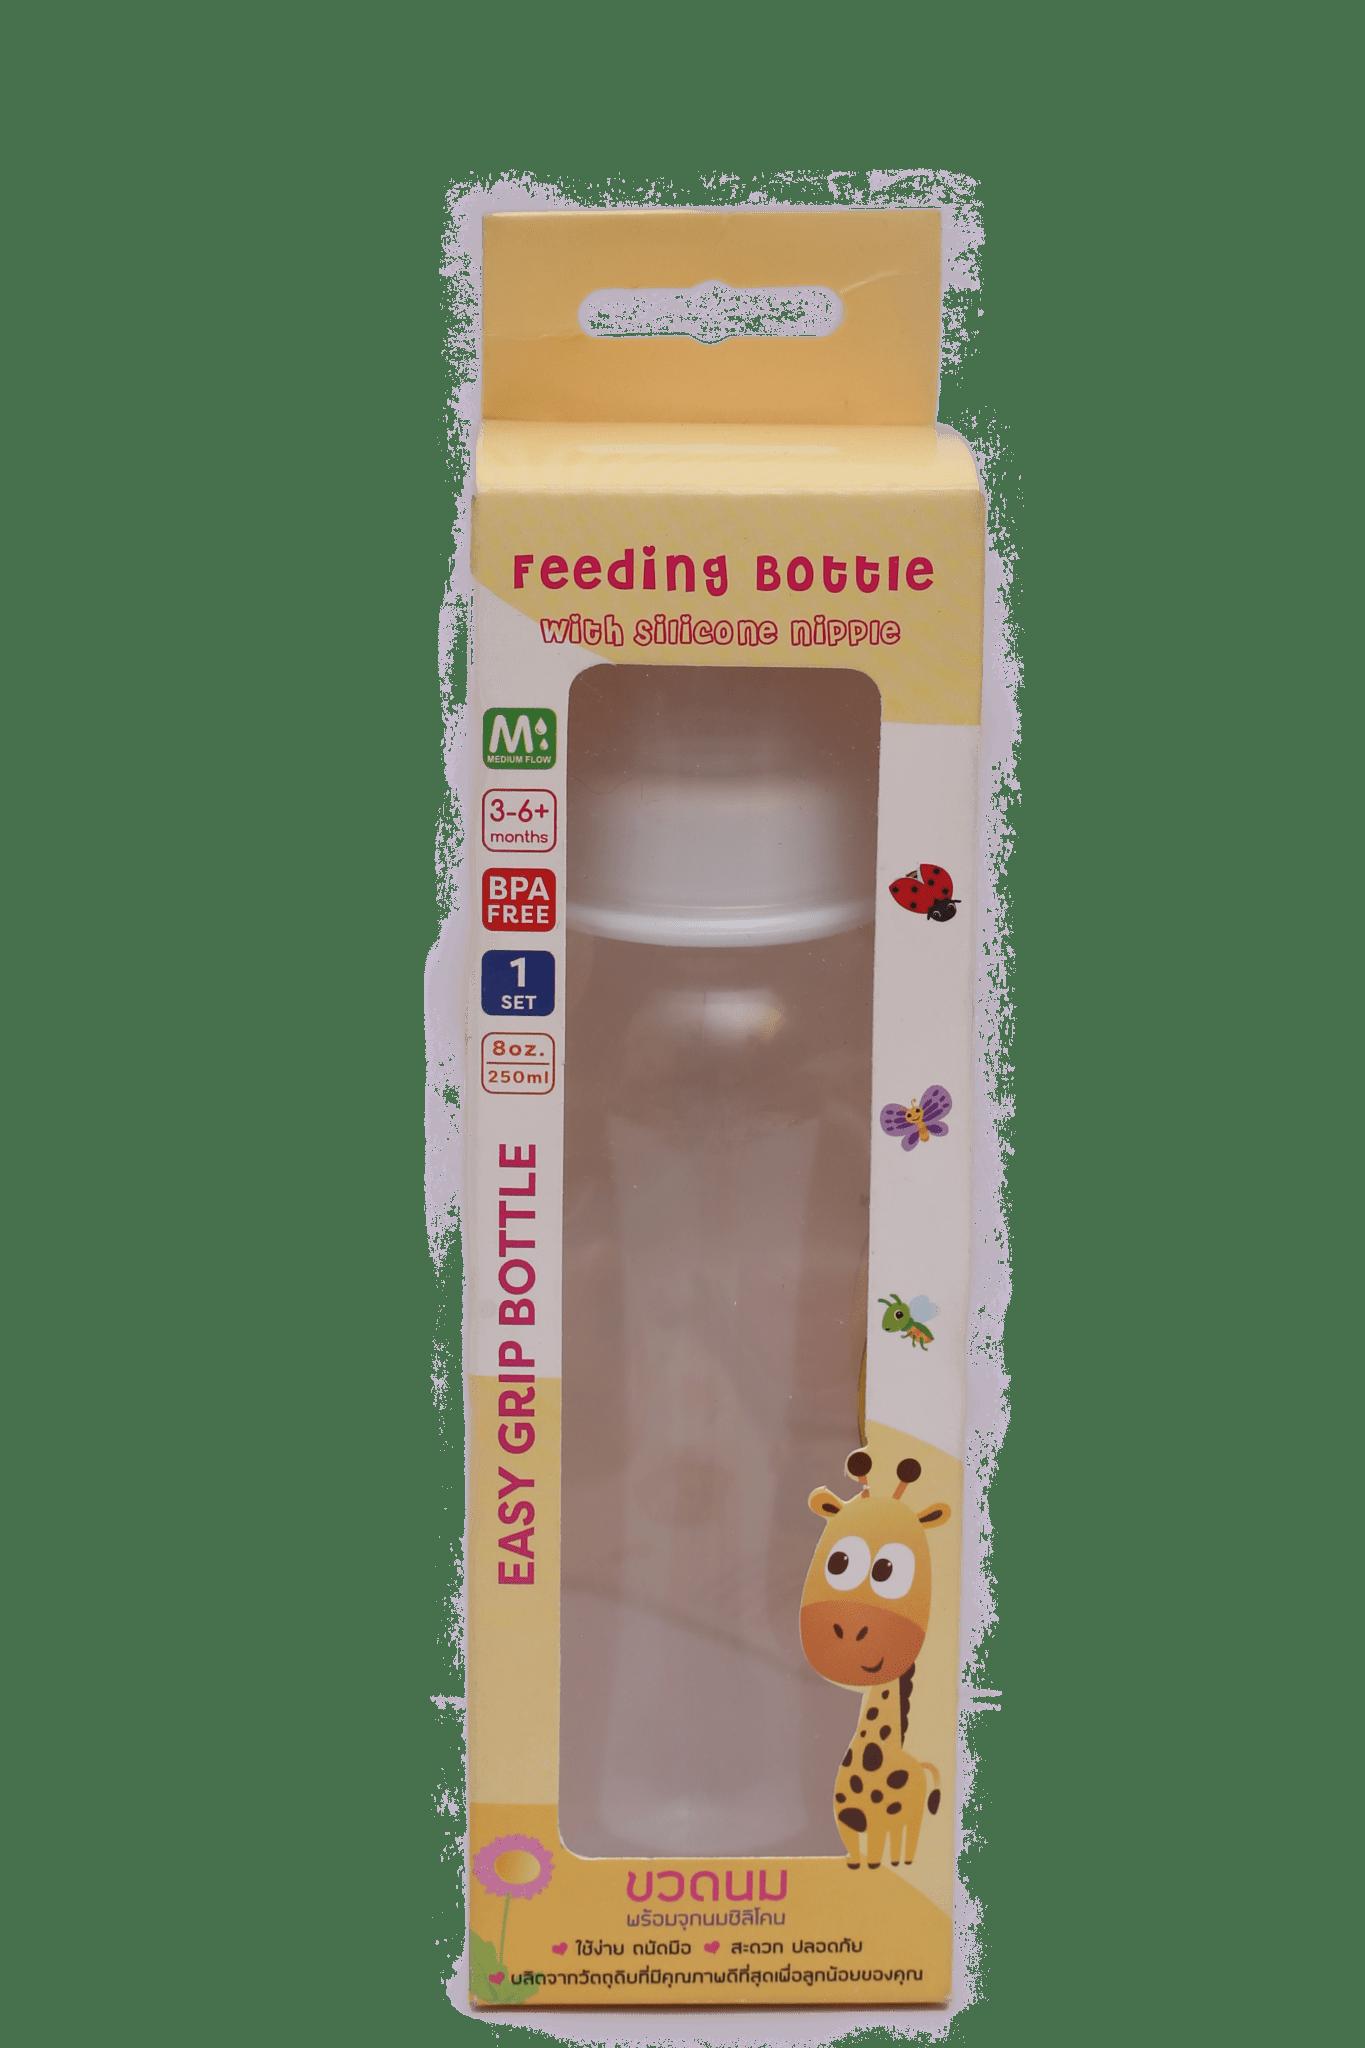 Puppu Baby Feeder 8oz / 250ml ( White )